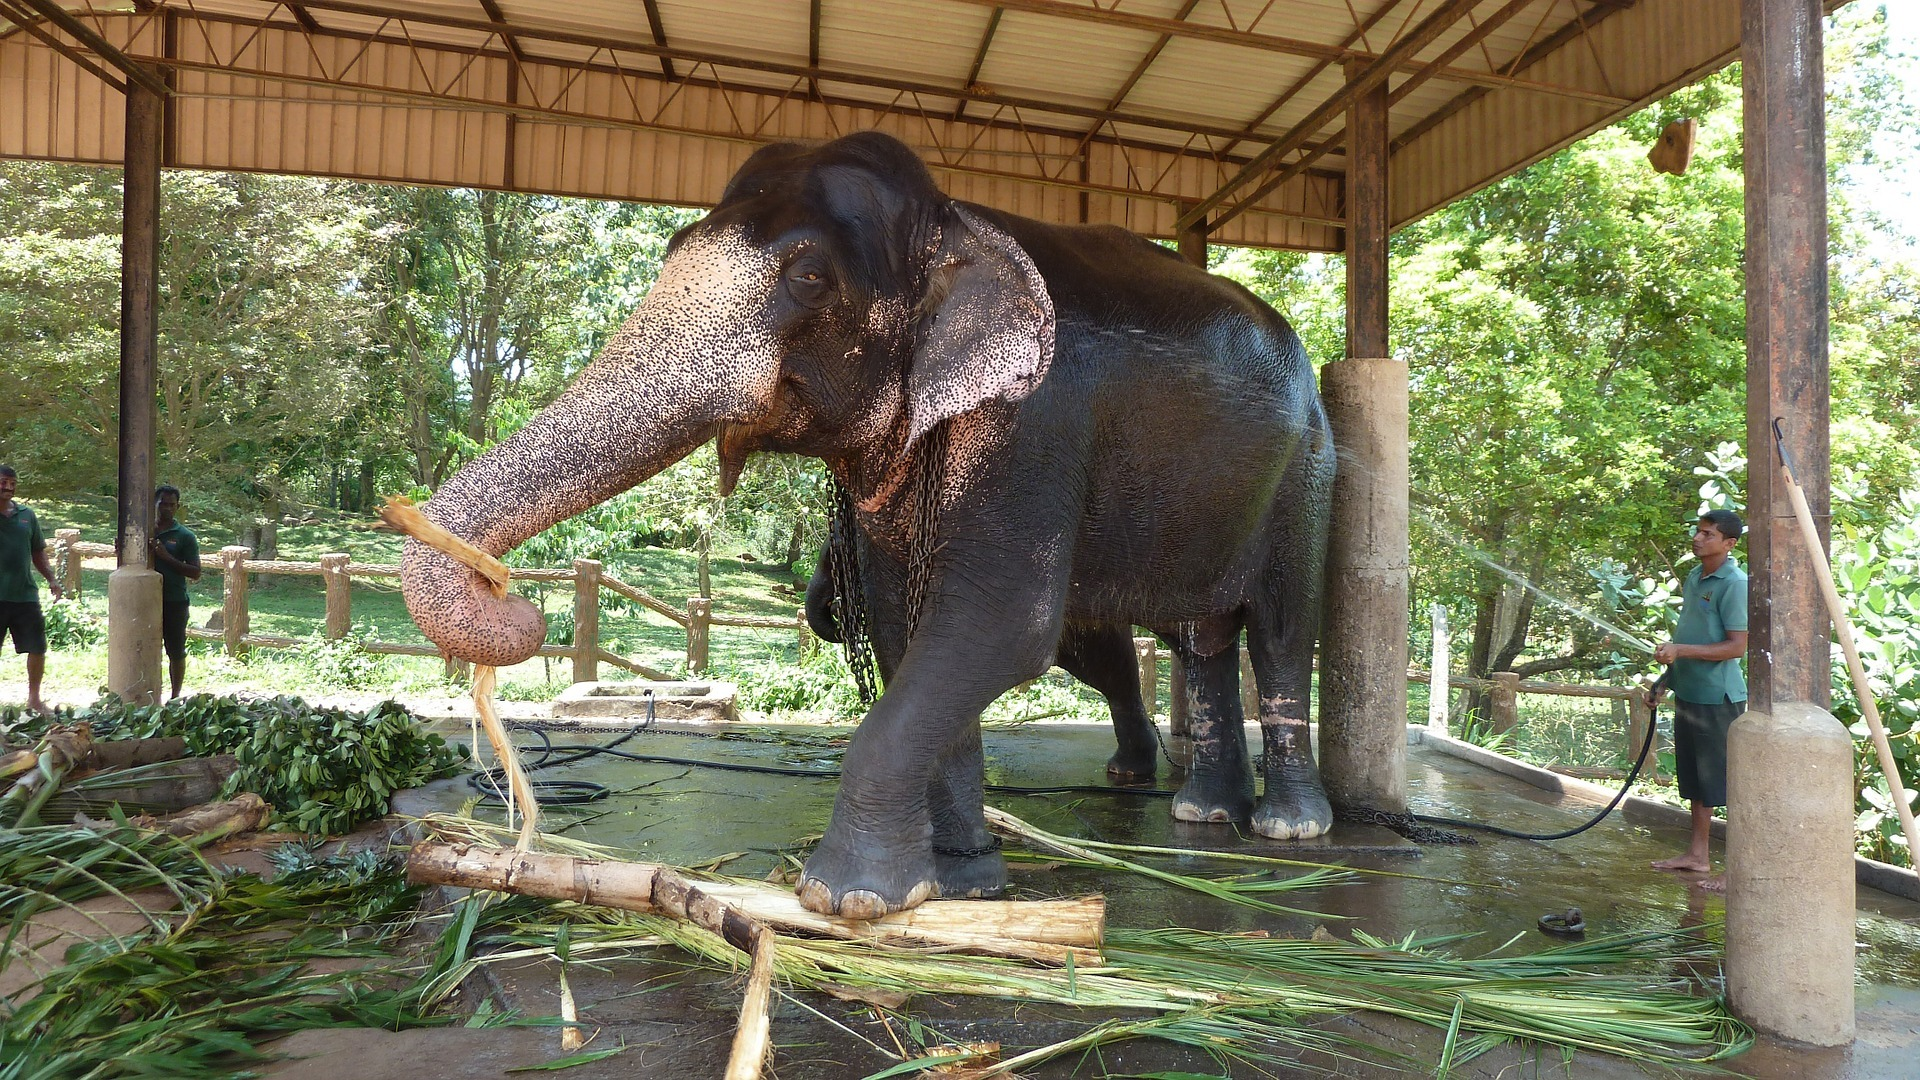 elephant-1351789_1920.jpg